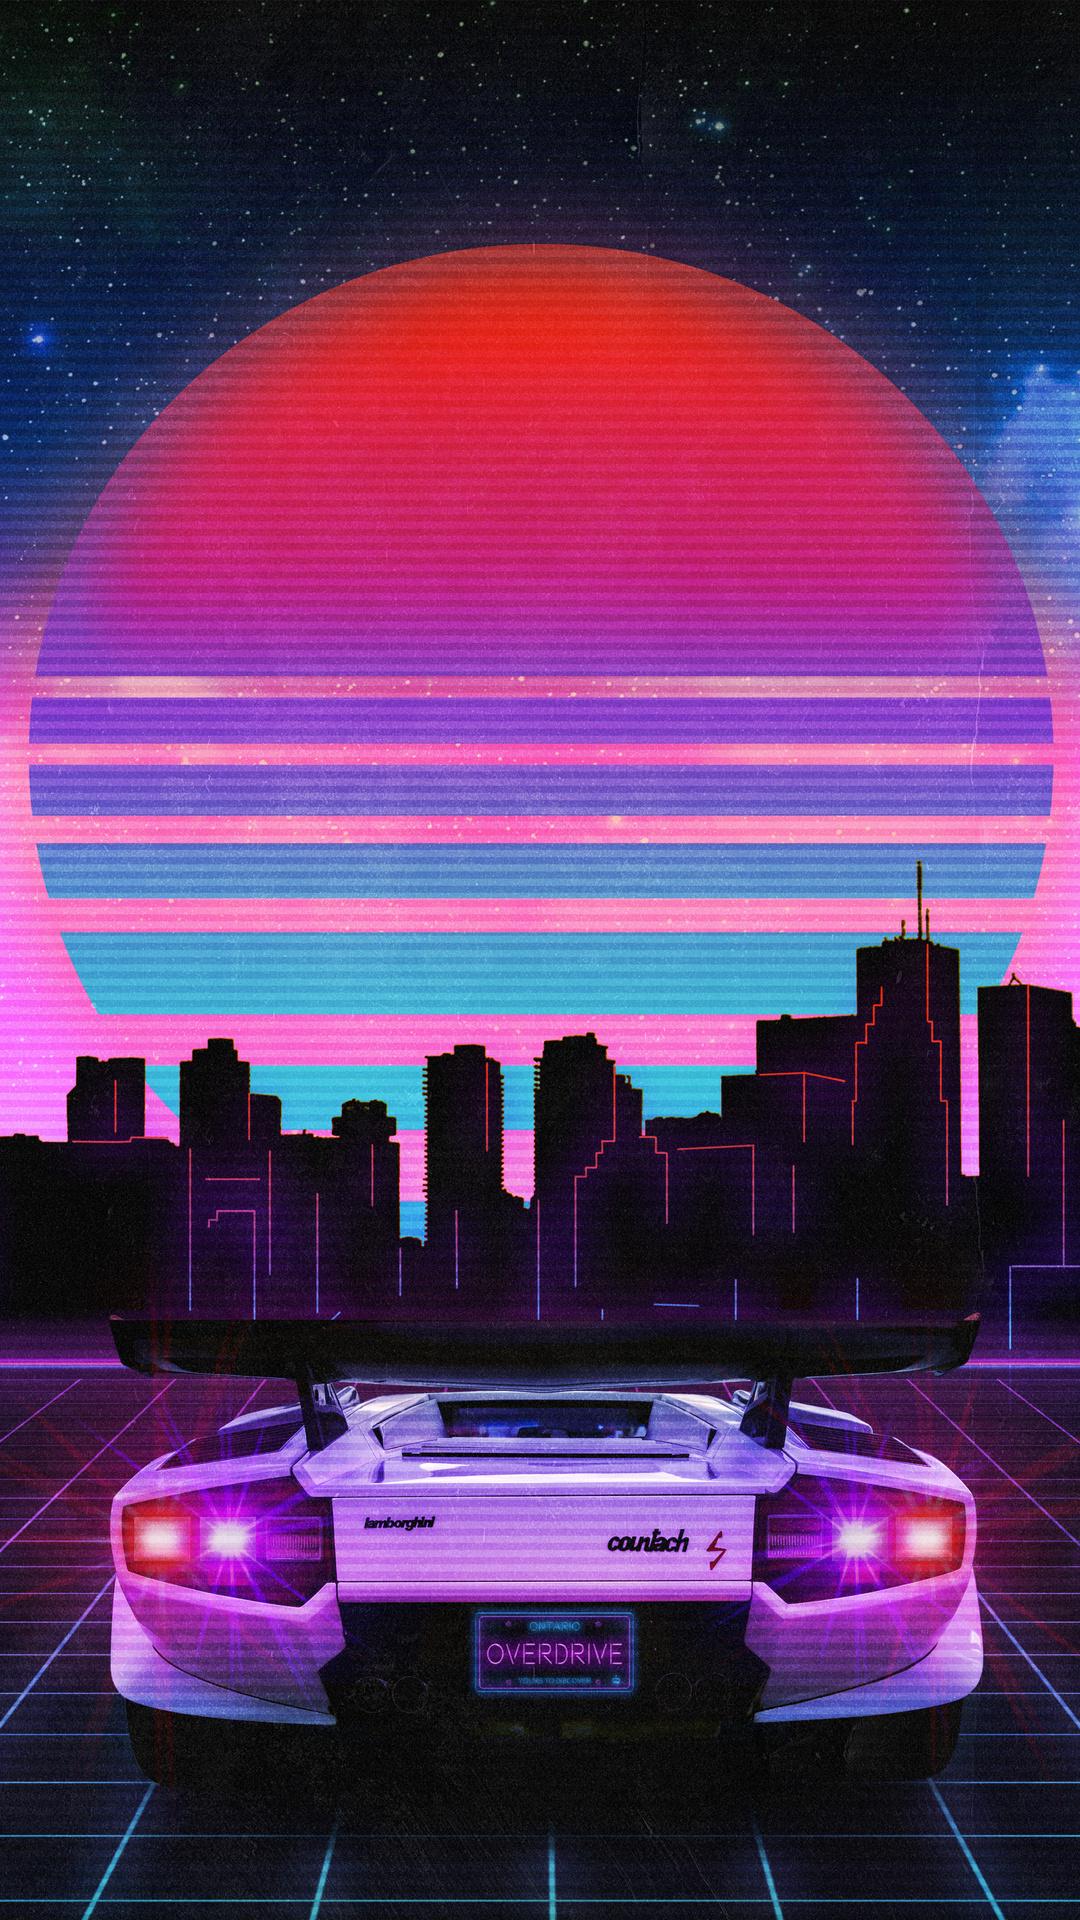 Retro Wave Lamborghini Neon City 5k Ny